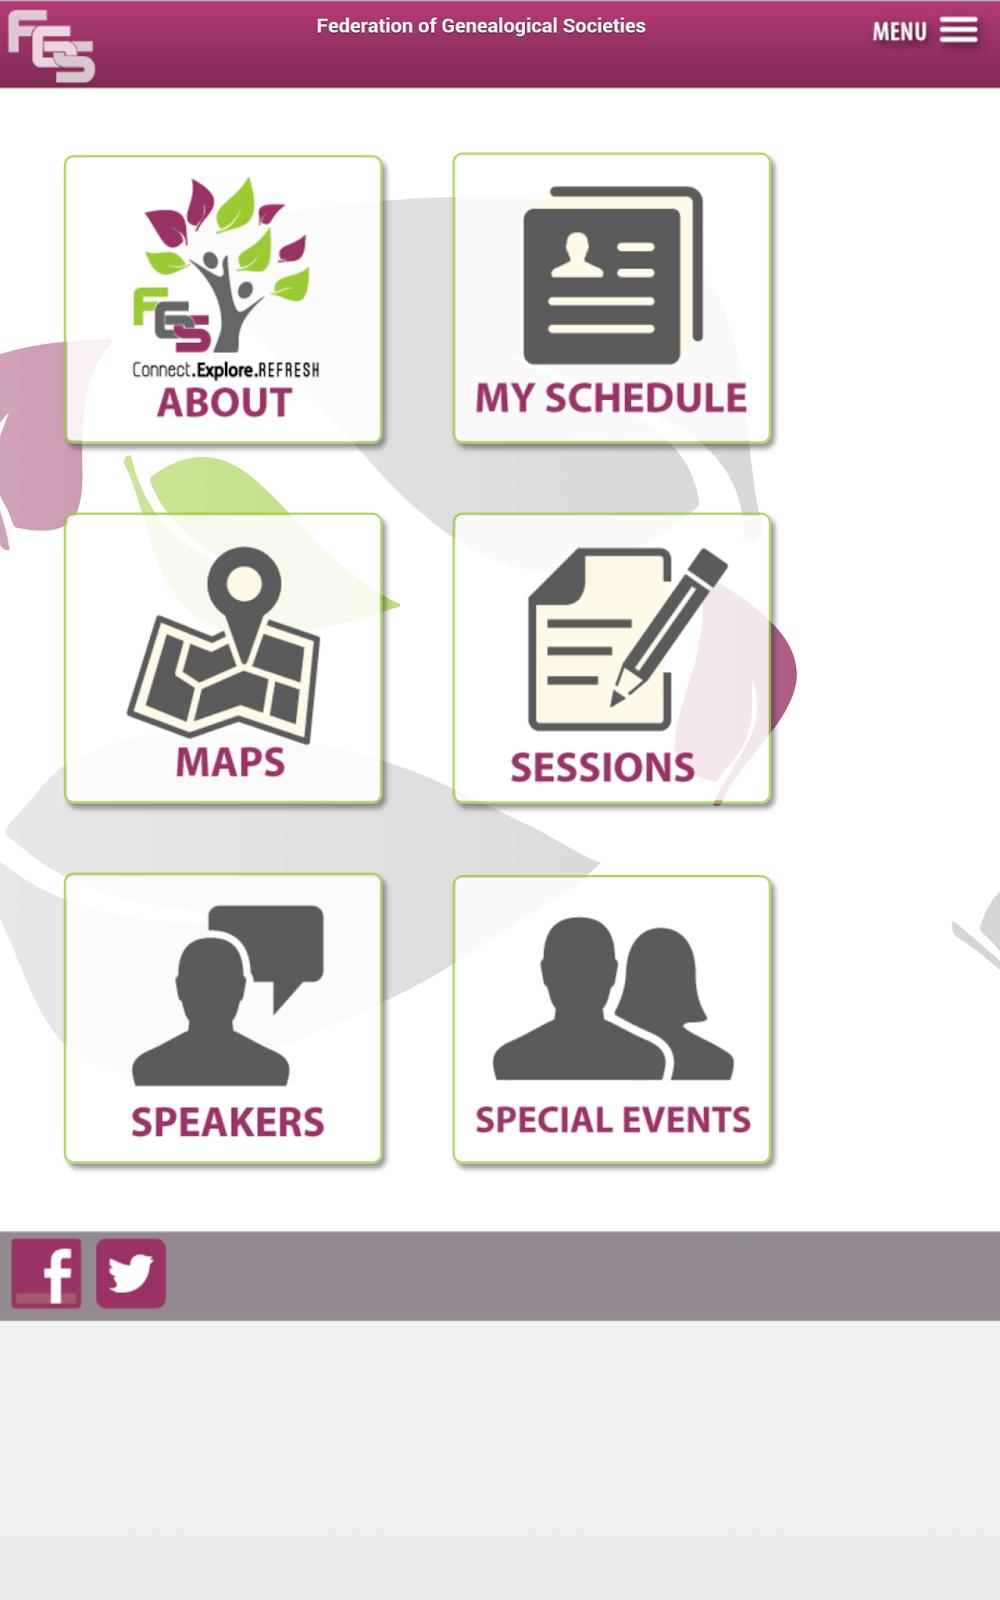 FGS App Conference Menu